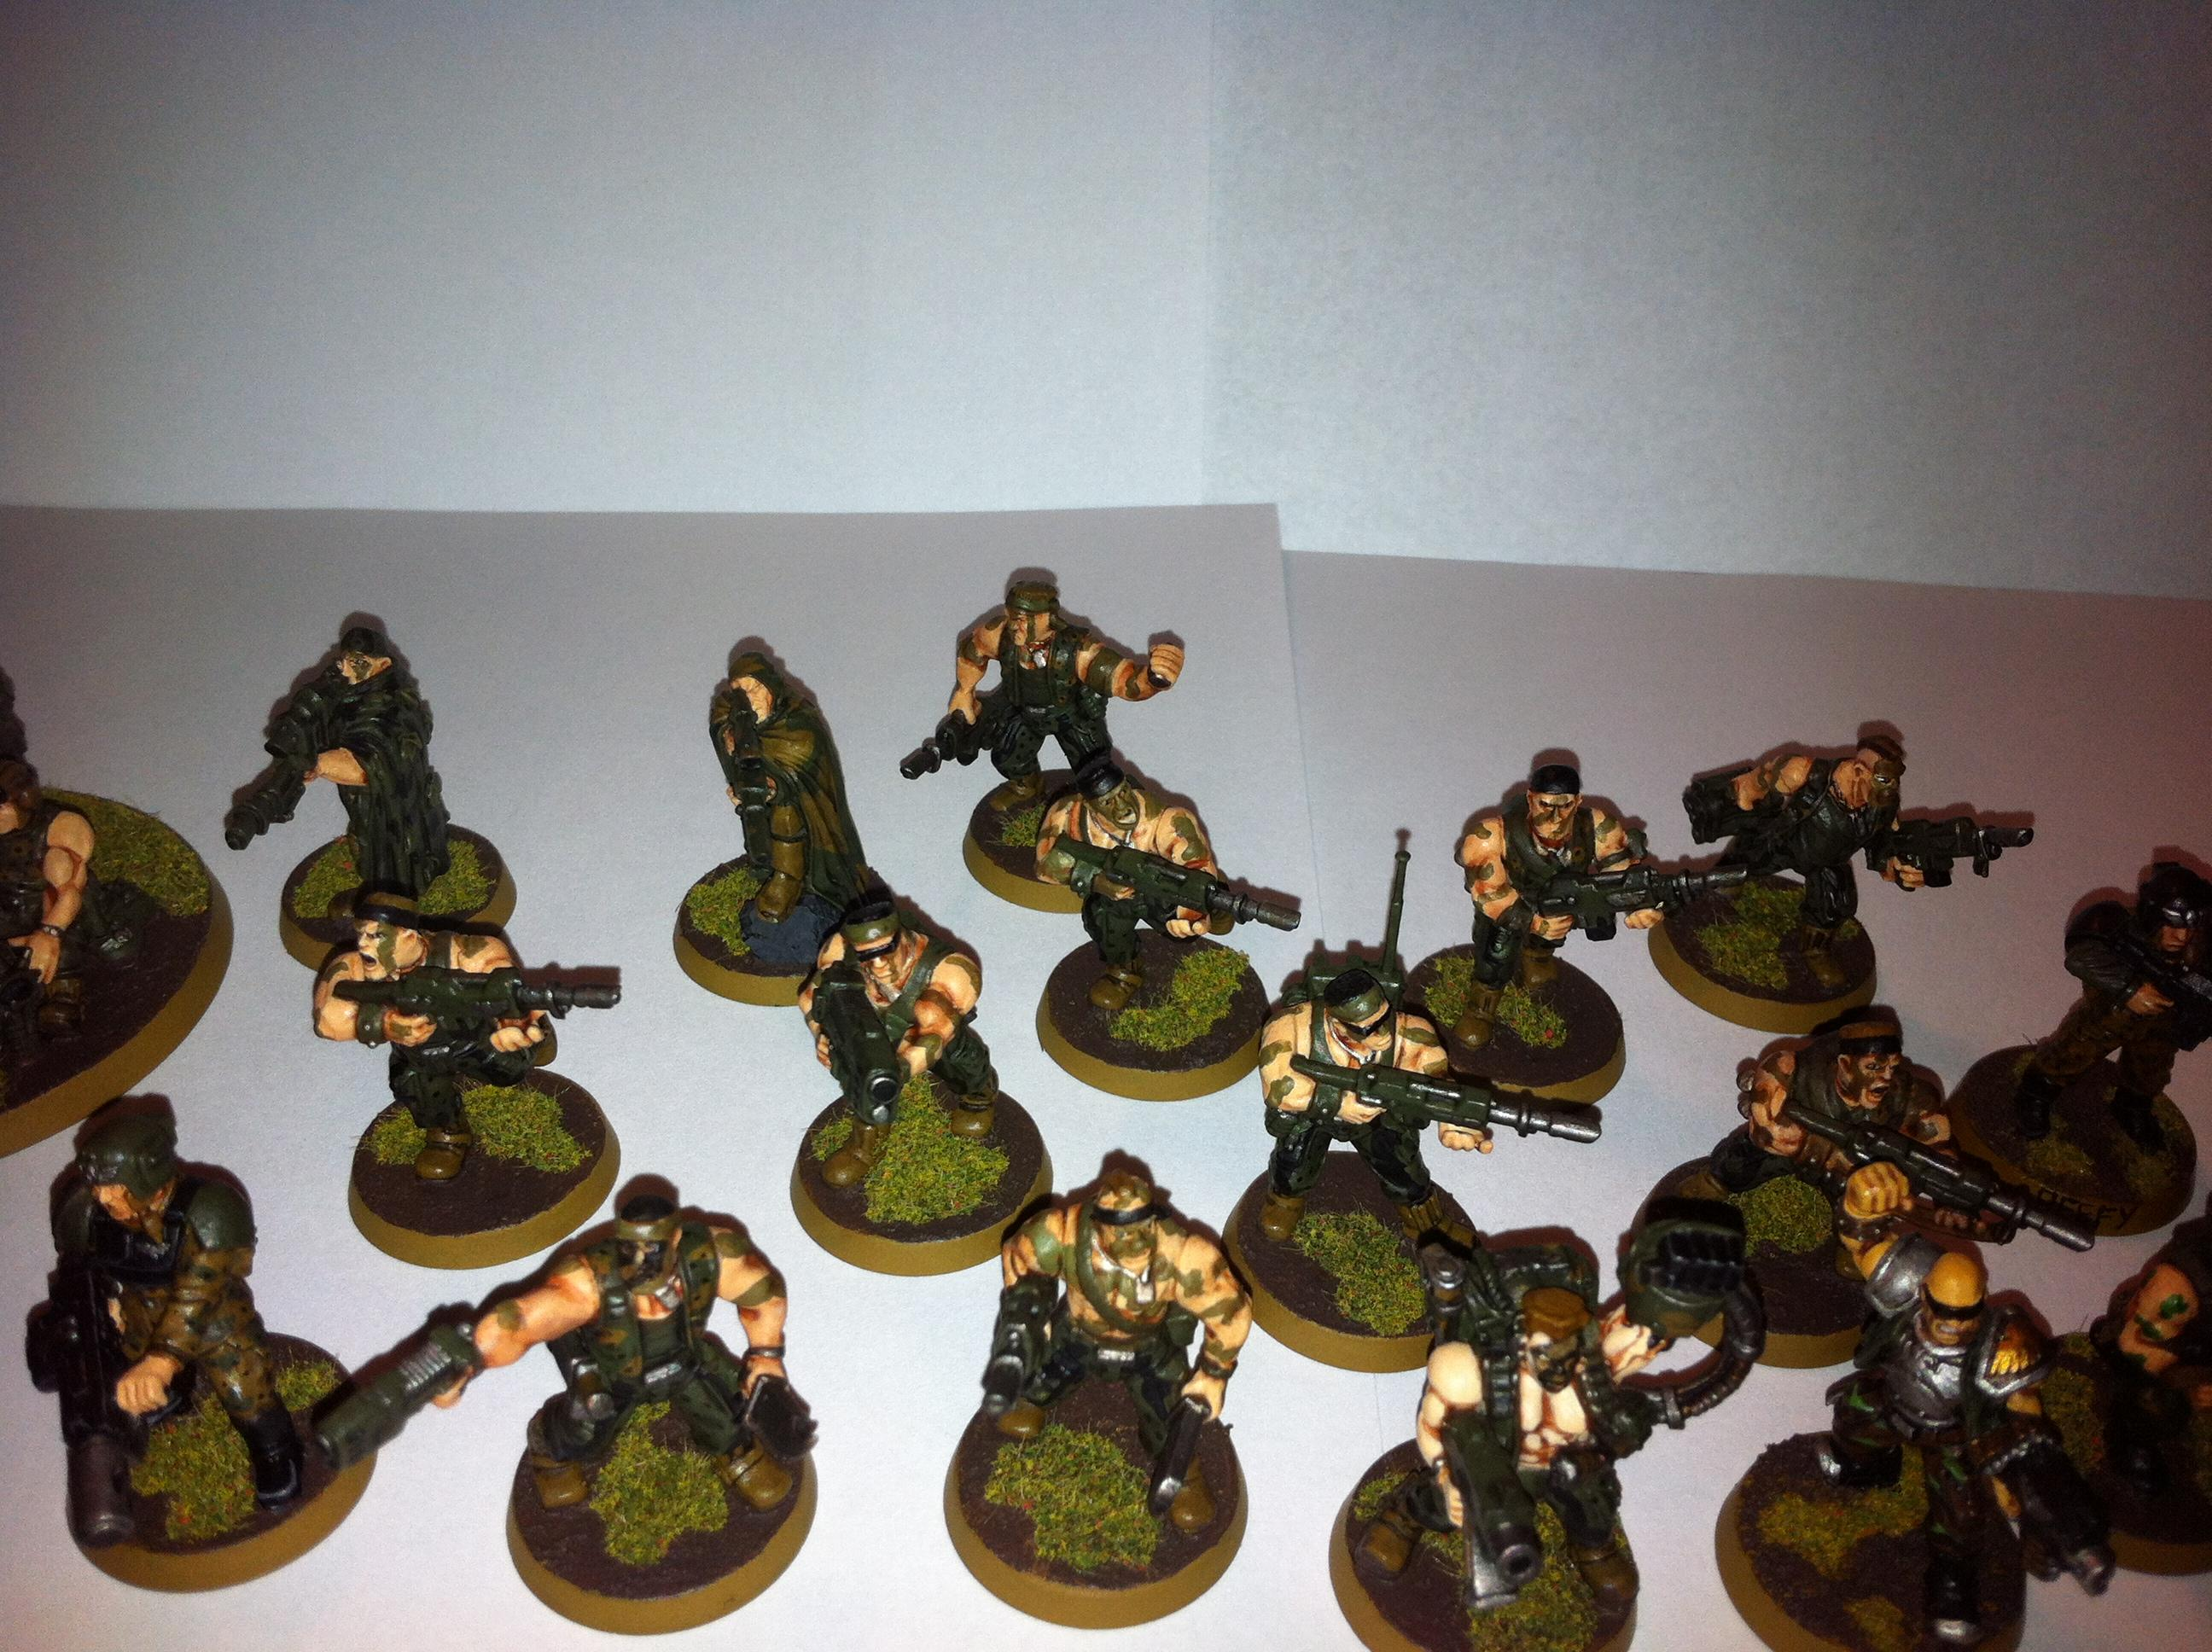 Catachan, Imperial Guard